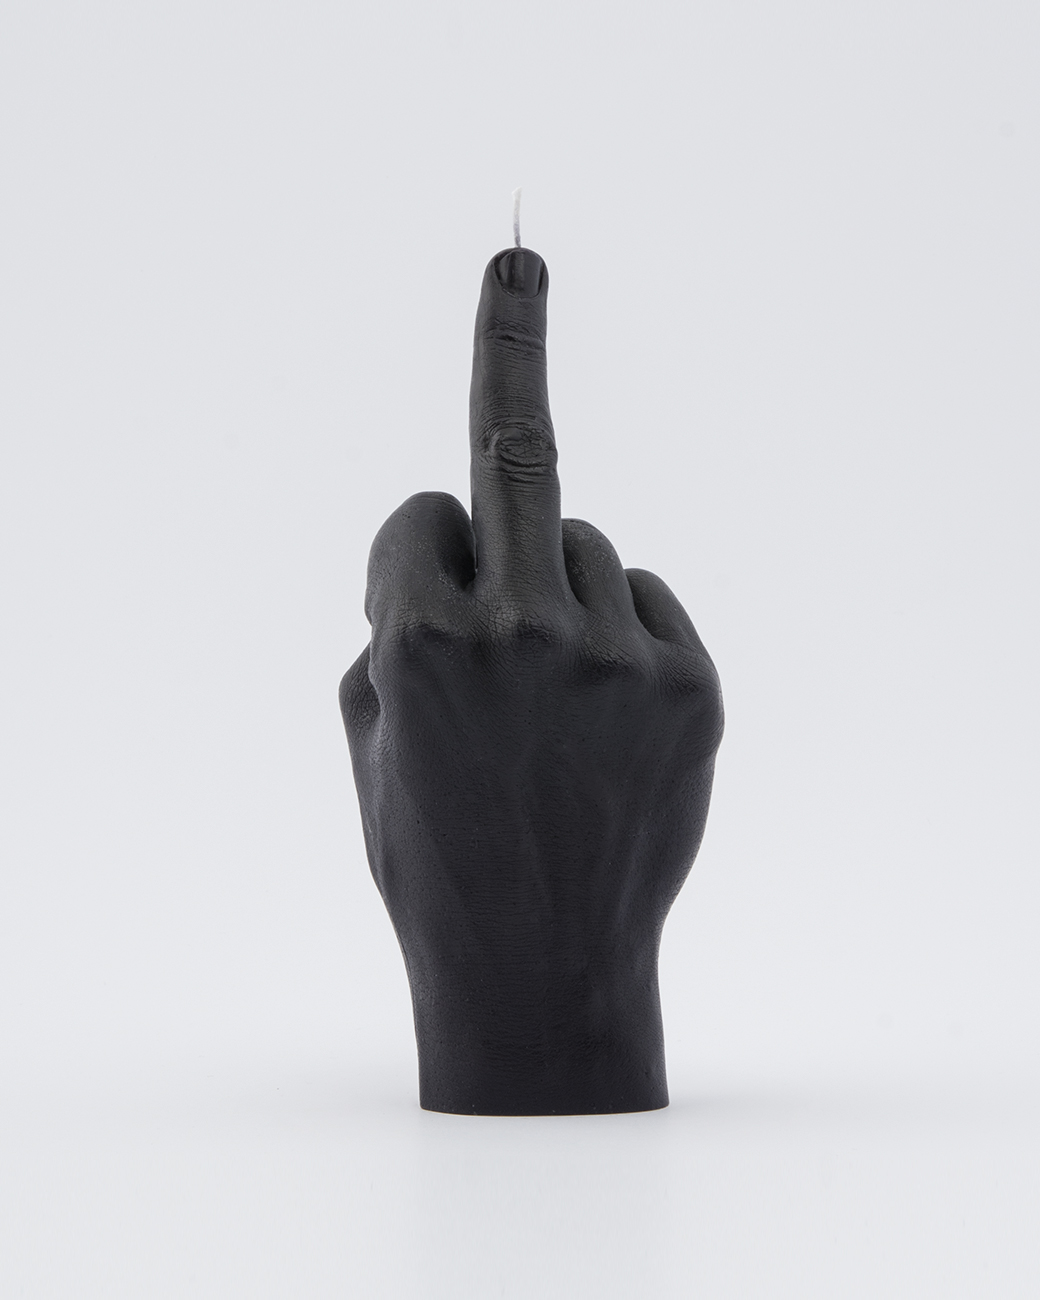 fcuk_you_black_4